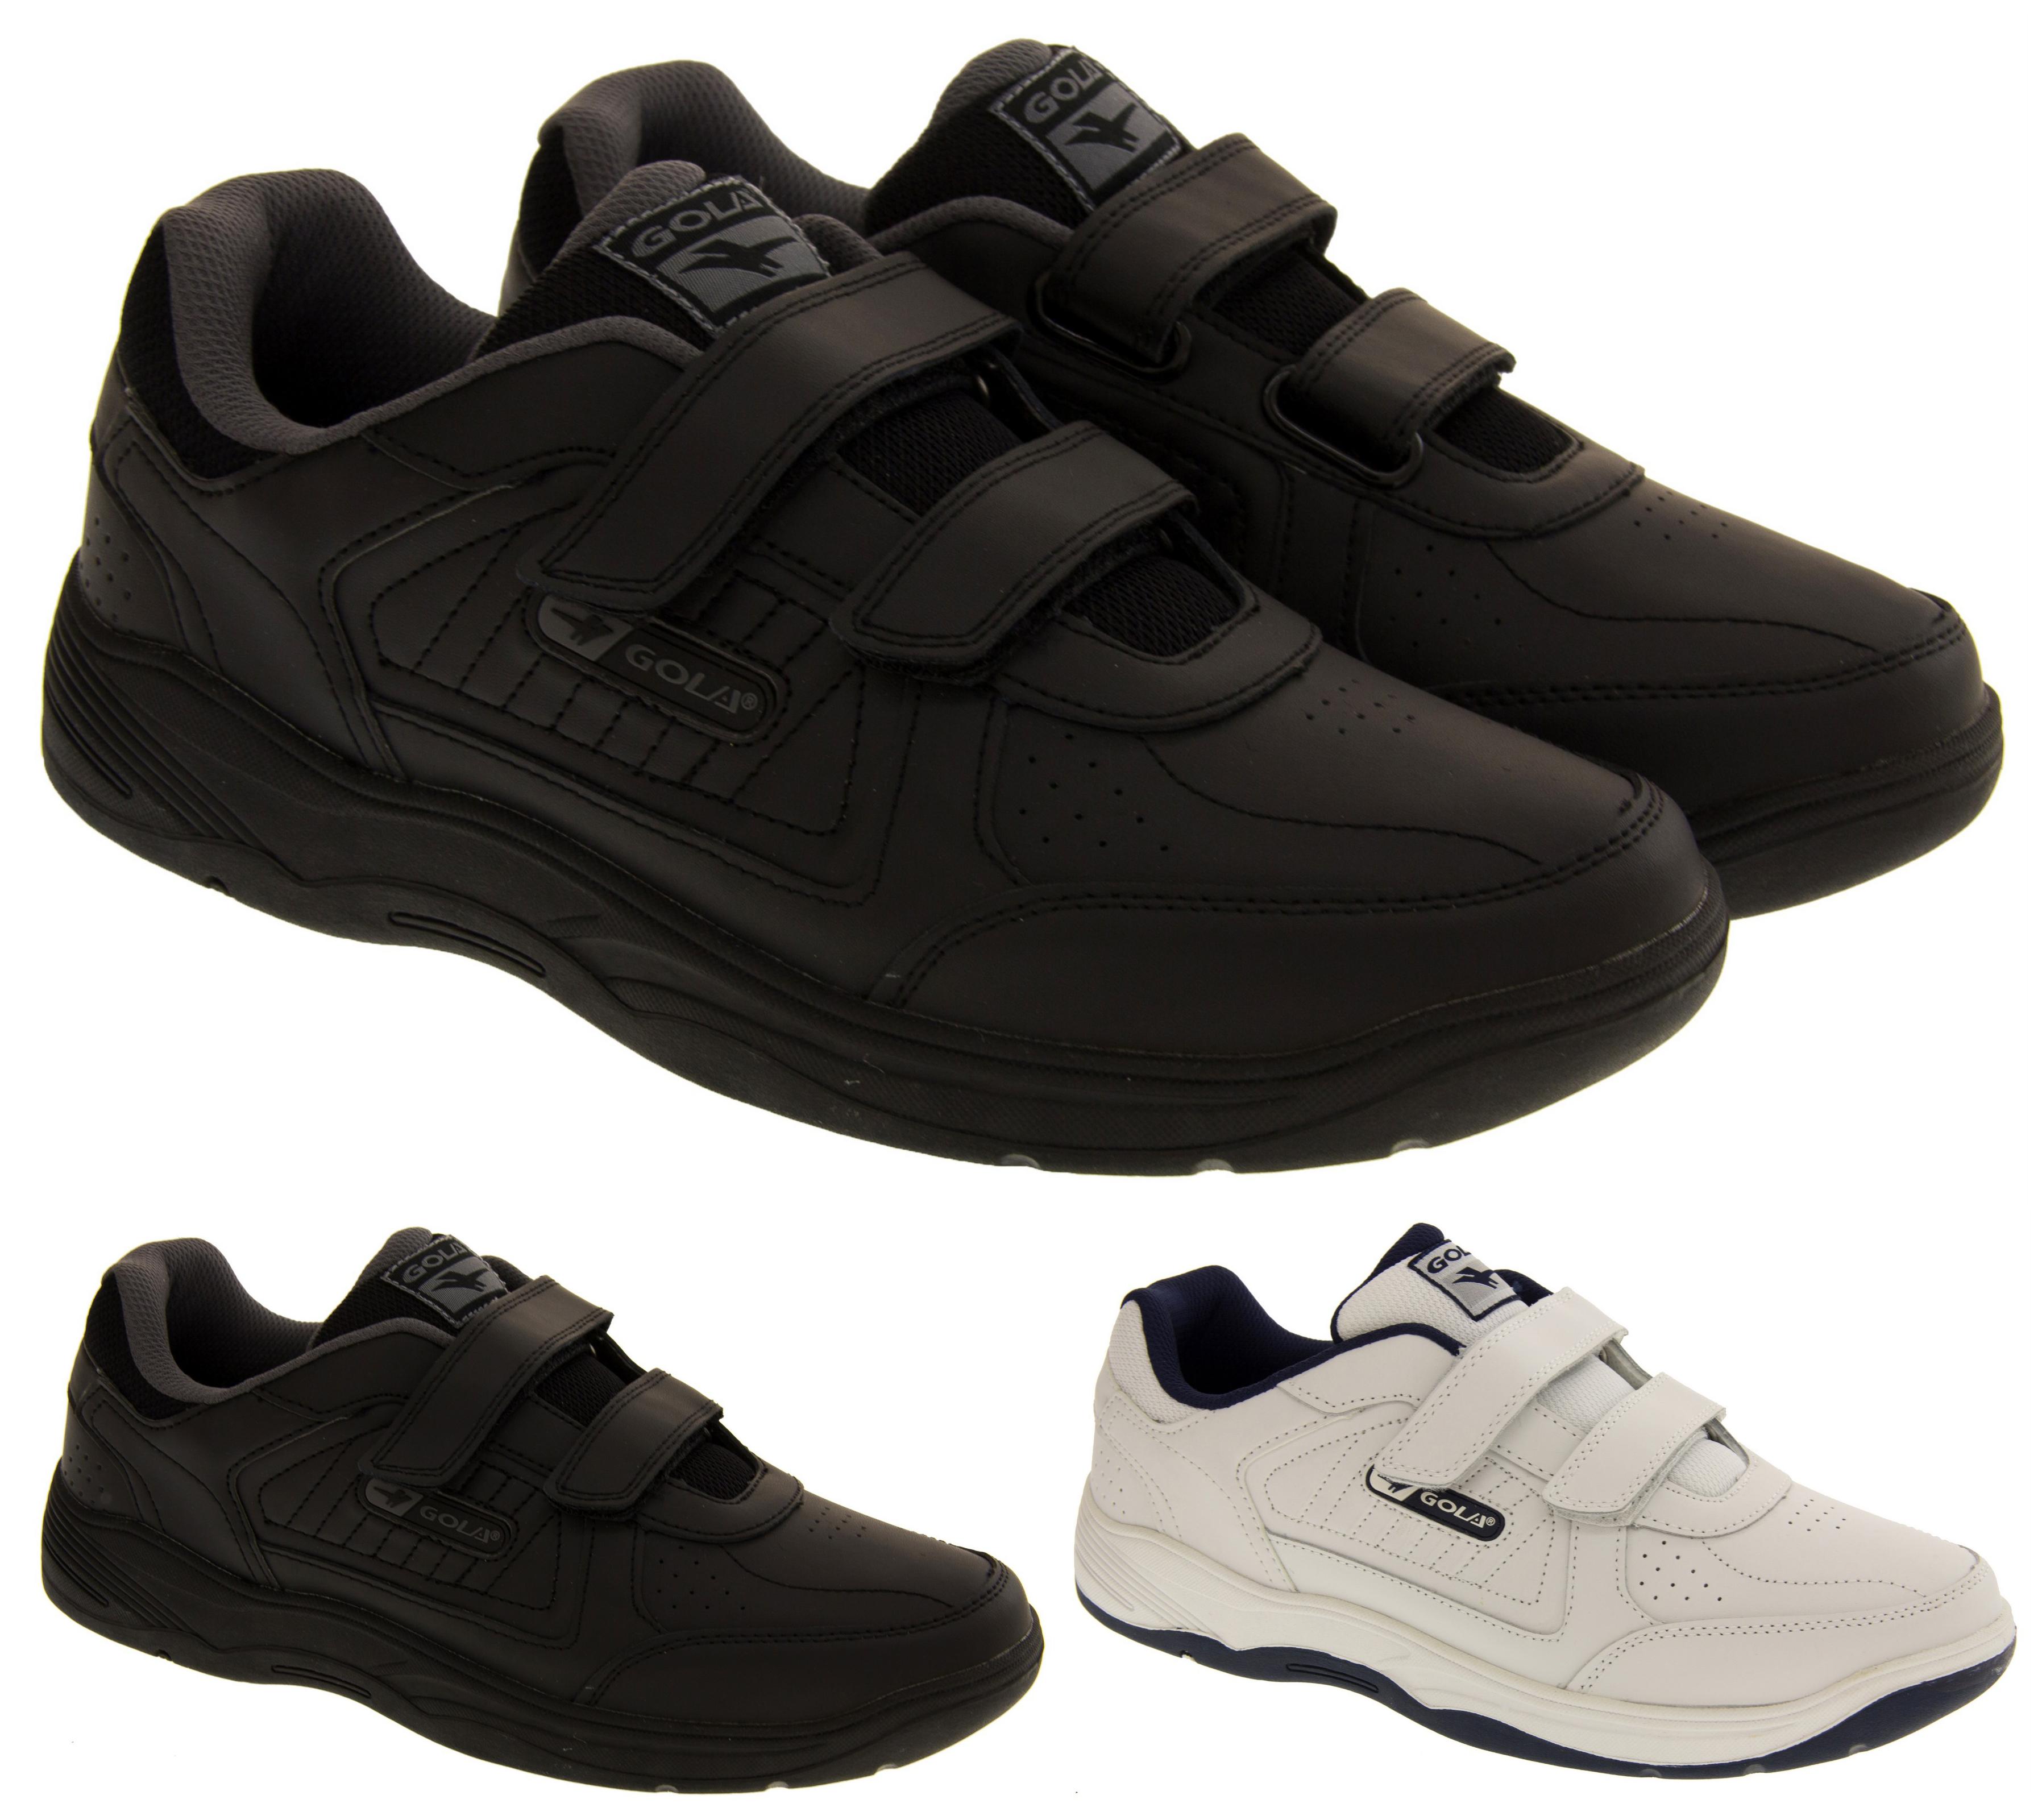 Gola Shoe Reviews